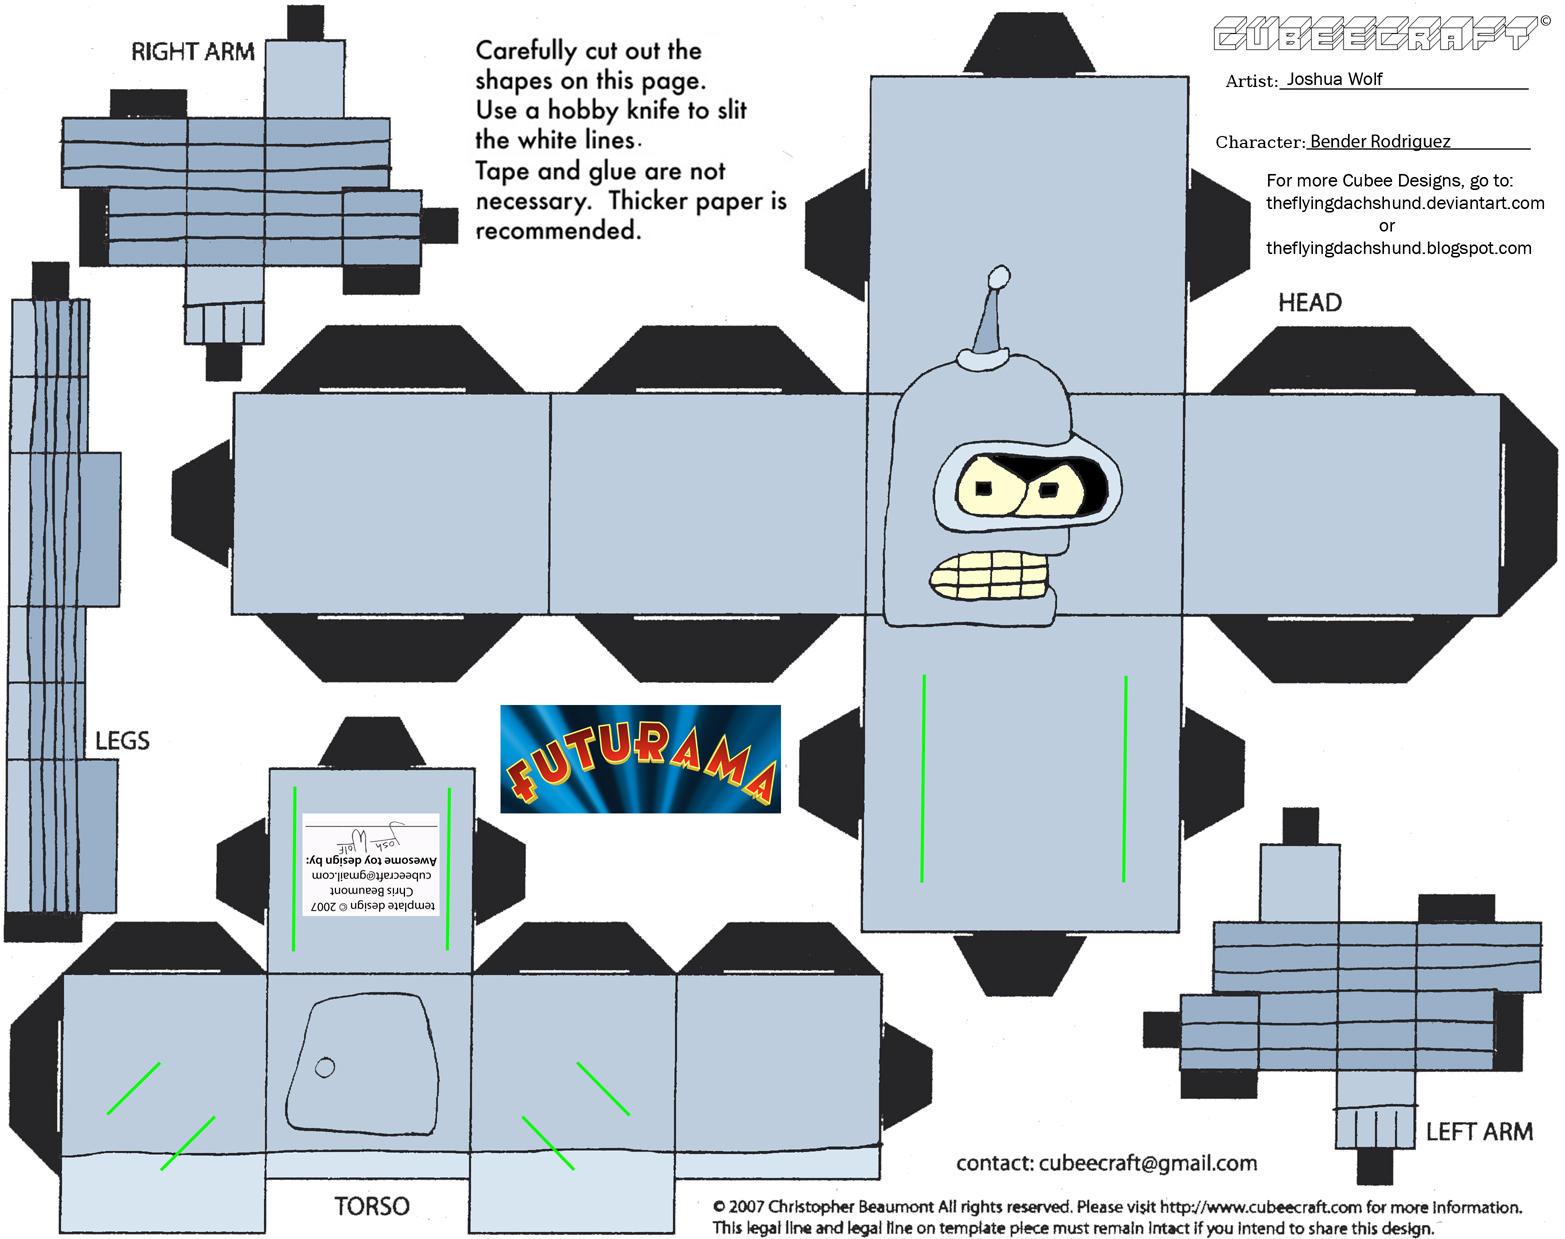 Fut1: Bender Rodriguez Cubee by TheFlyingDachshund